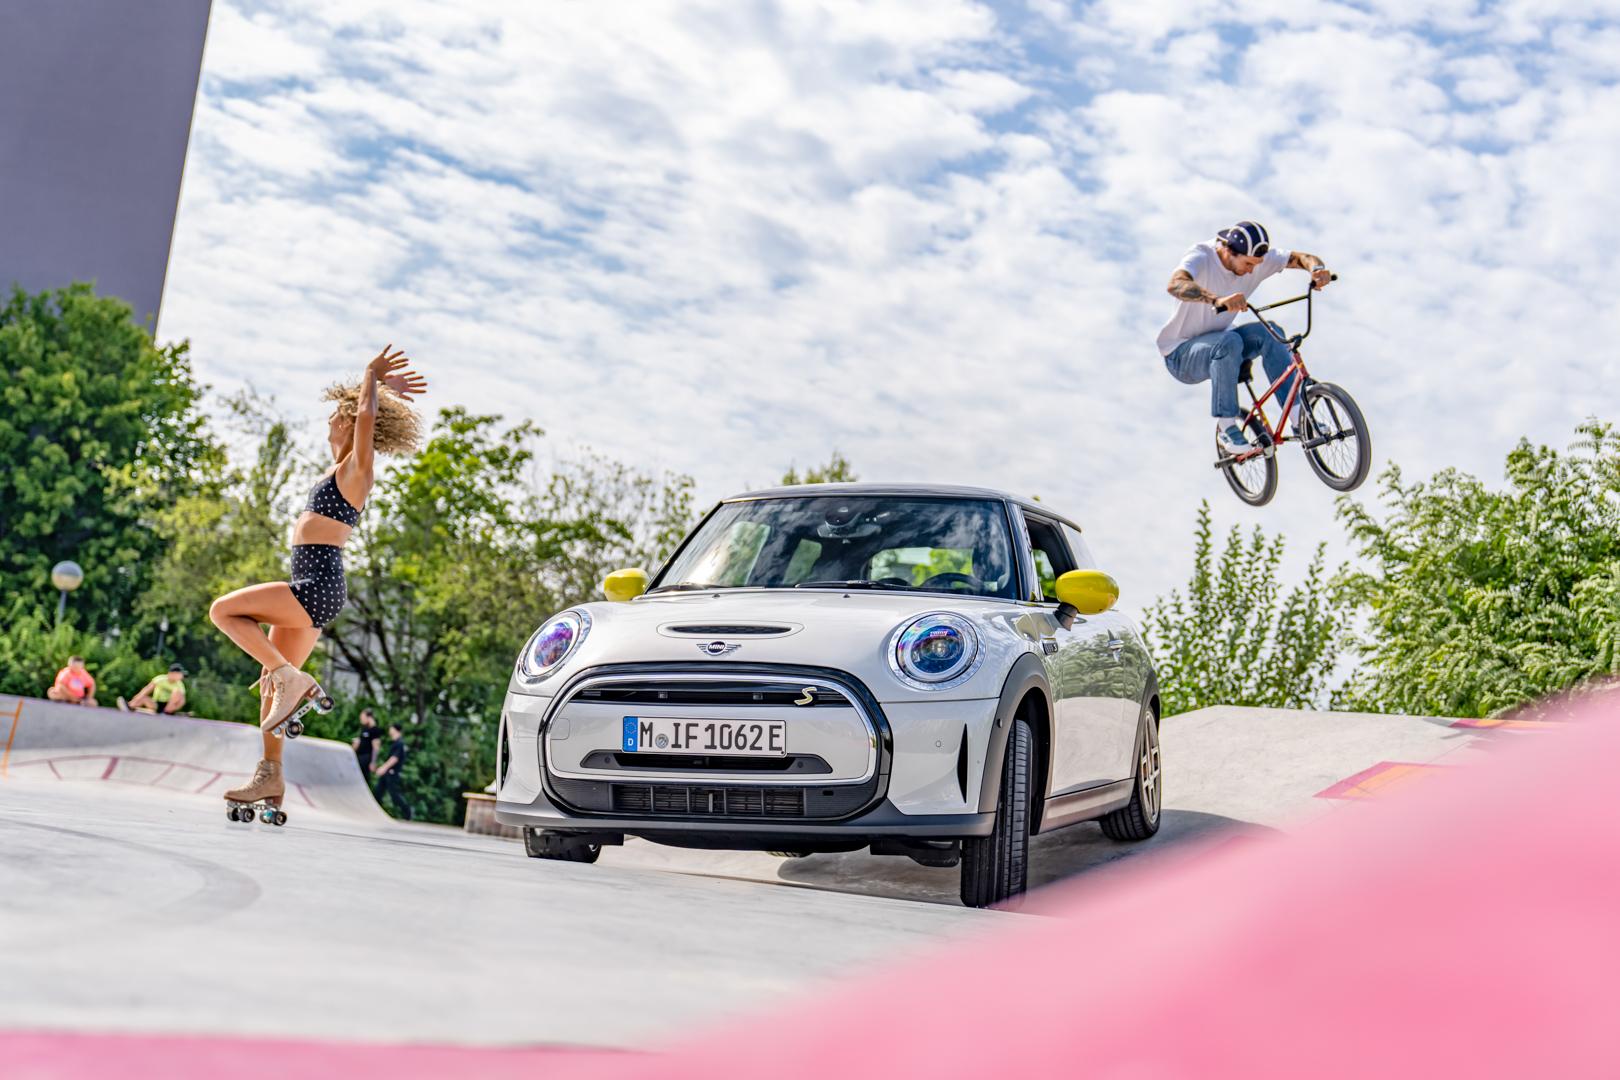 MINI and the IAA Mobility 2021: #BIGLOVE – a feeling that lasts